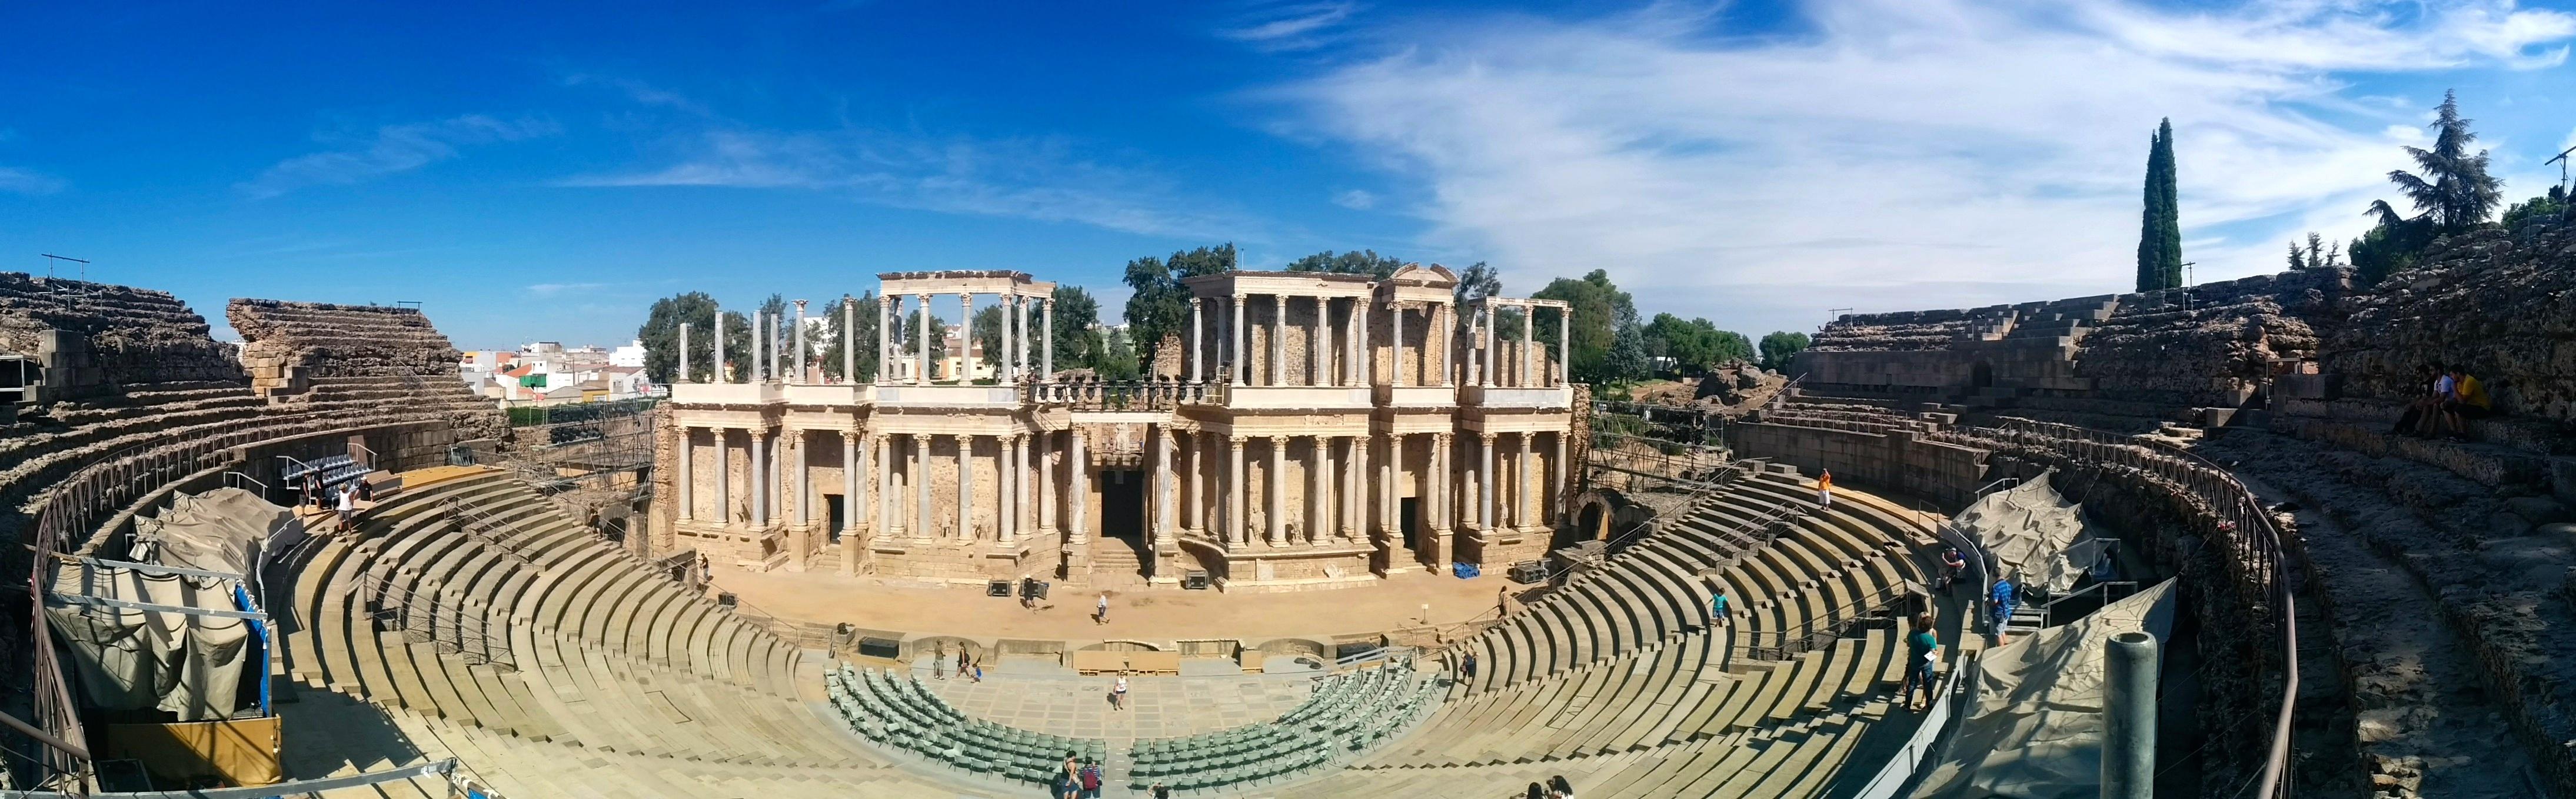 File:Vista panorámica del Teatro Romano de Mérida.jpg - Wikimedia Commons